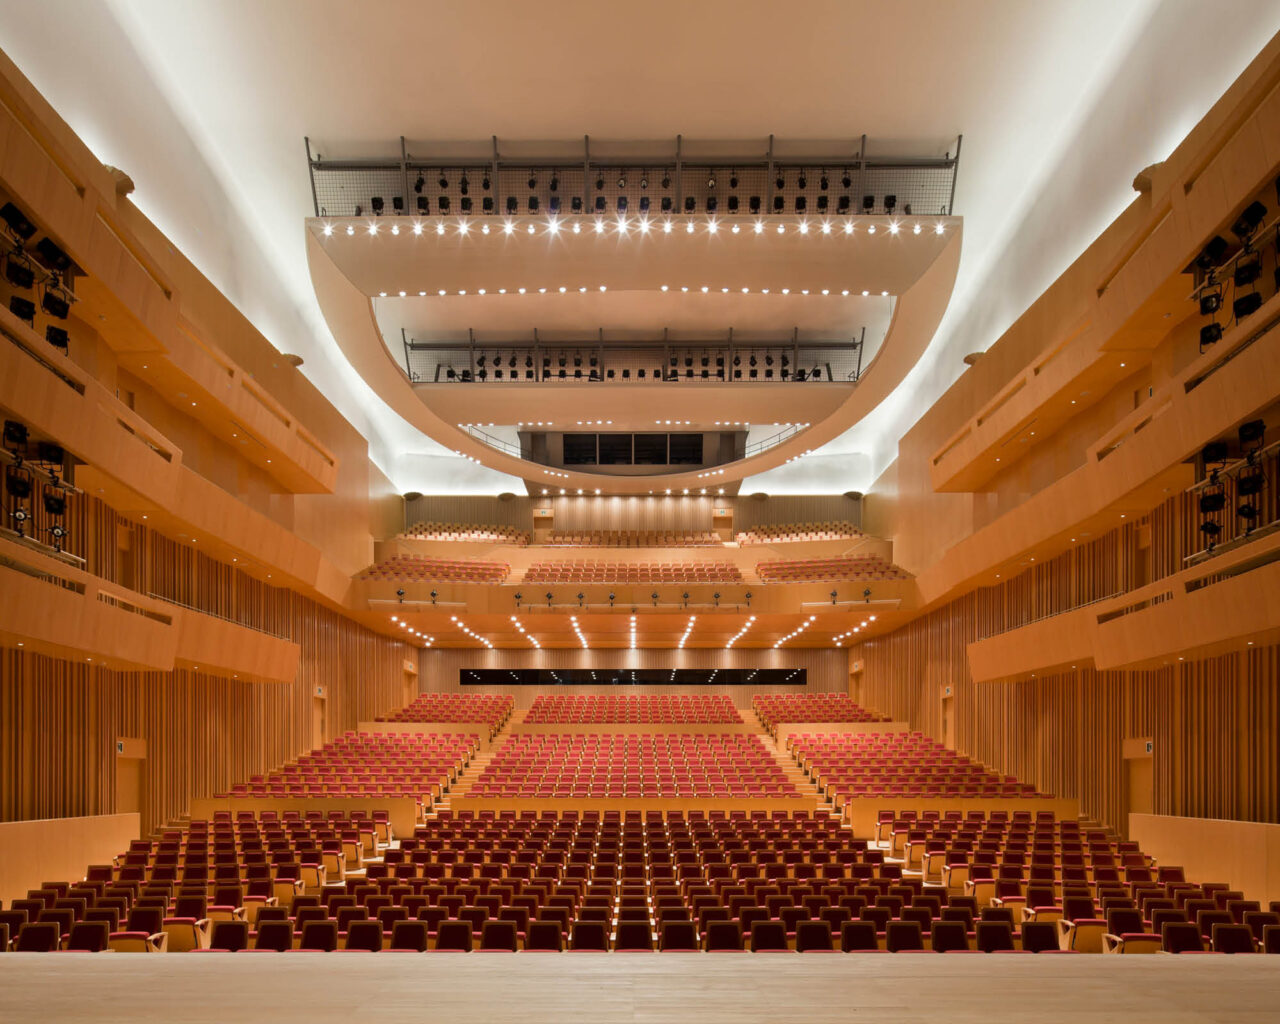 https://www.shizuoka-cb.com/wp-content/uploads/2021/02/photo-venues47-1280x1024.jpg